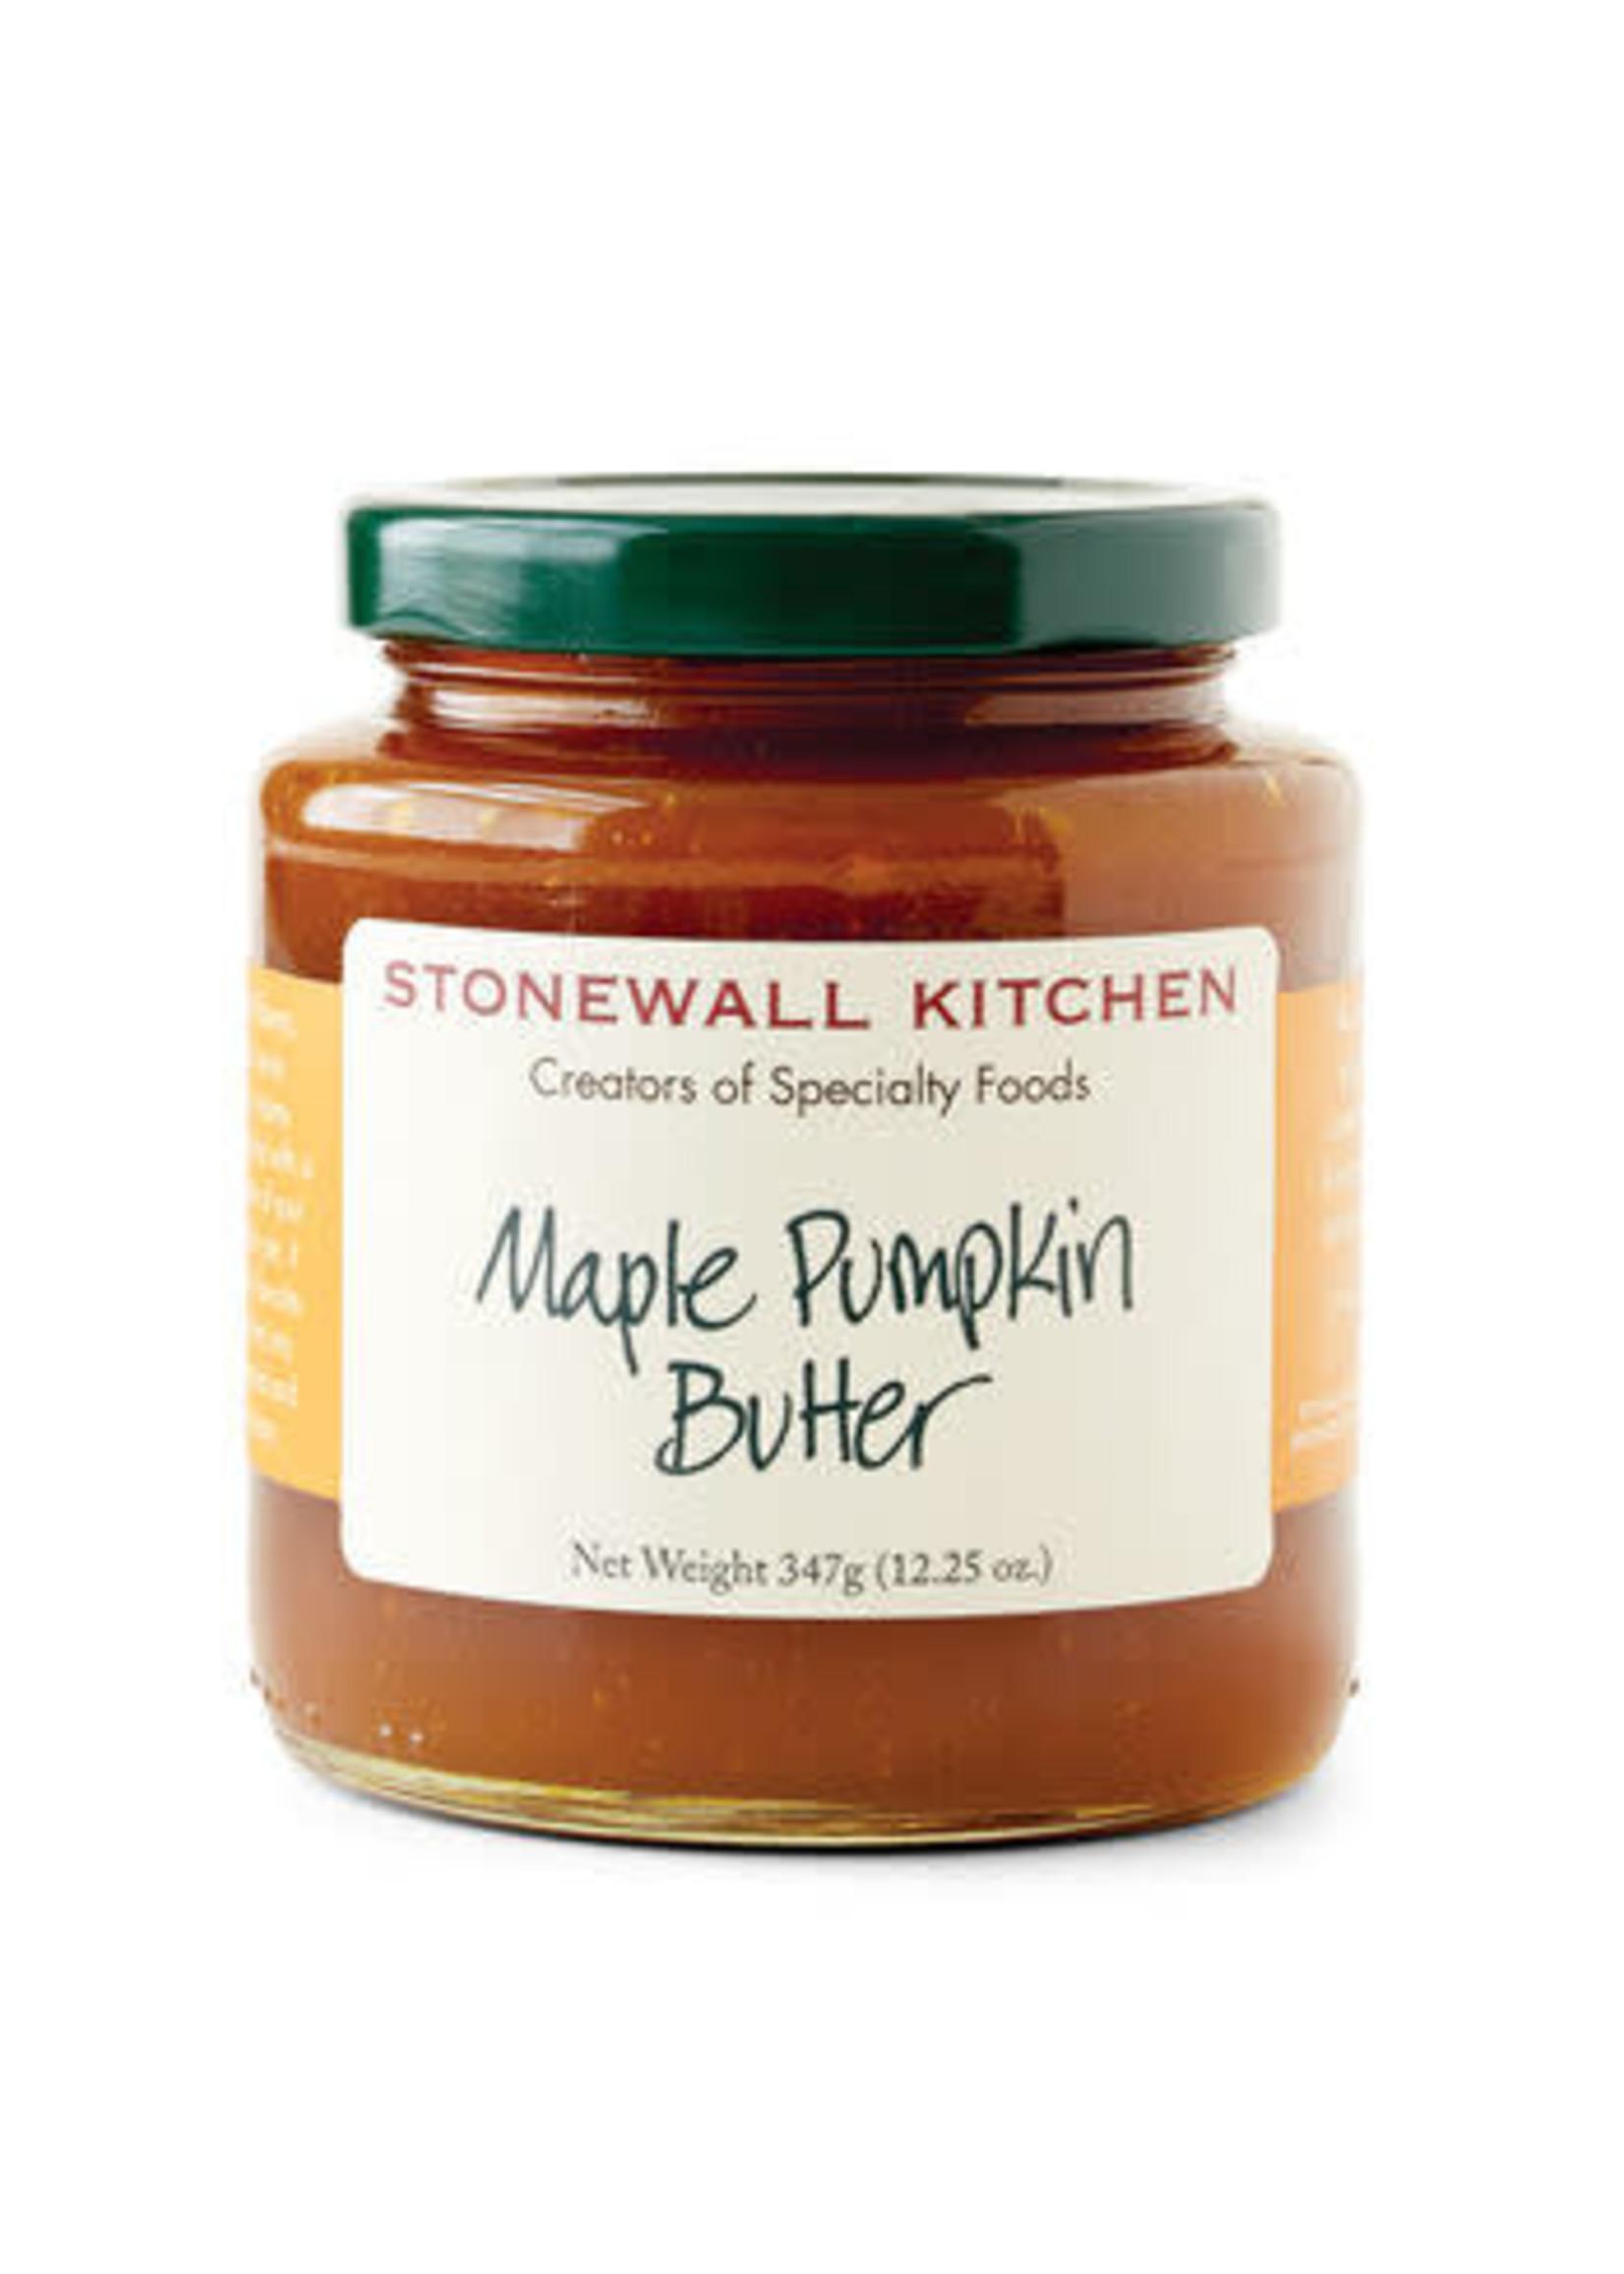 Stonewall Kitchen Maple Pumpkin Butter